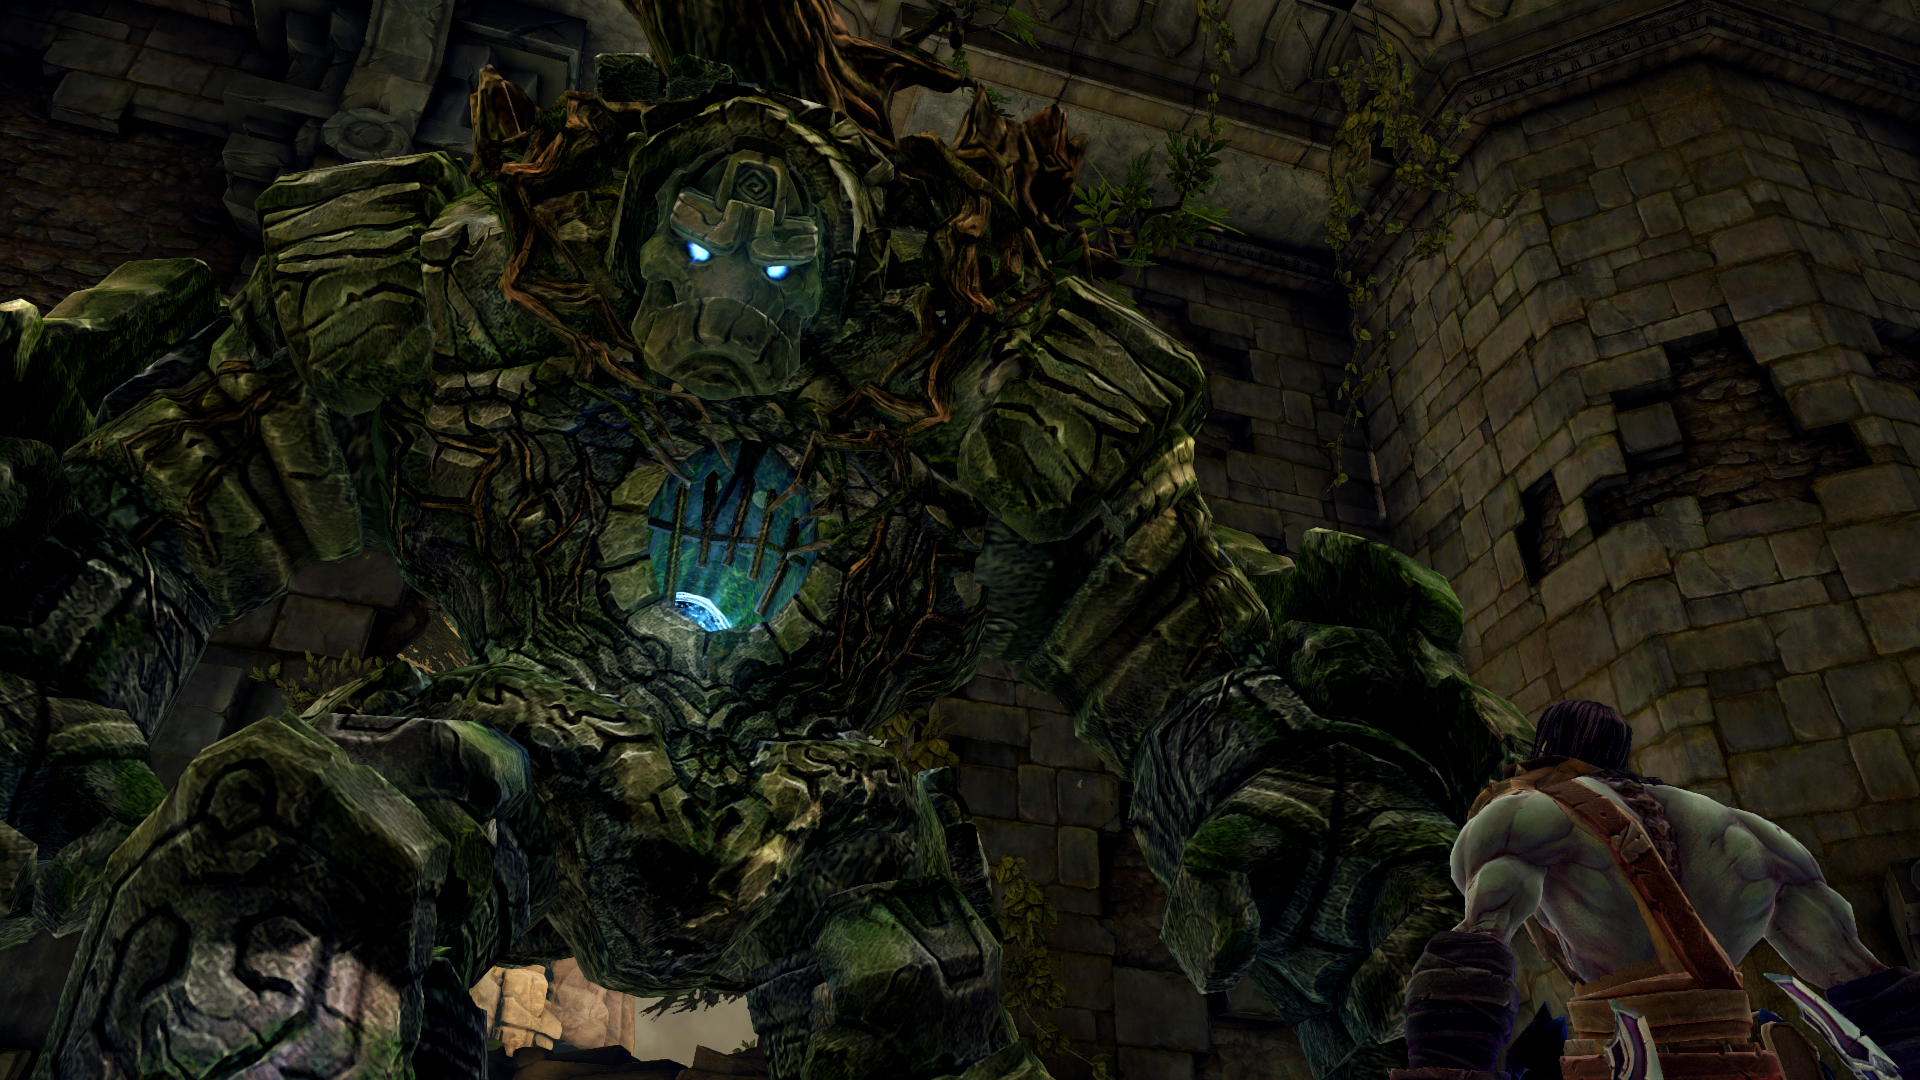 Darksider 2 Deathinitive Edition Screenshot 1